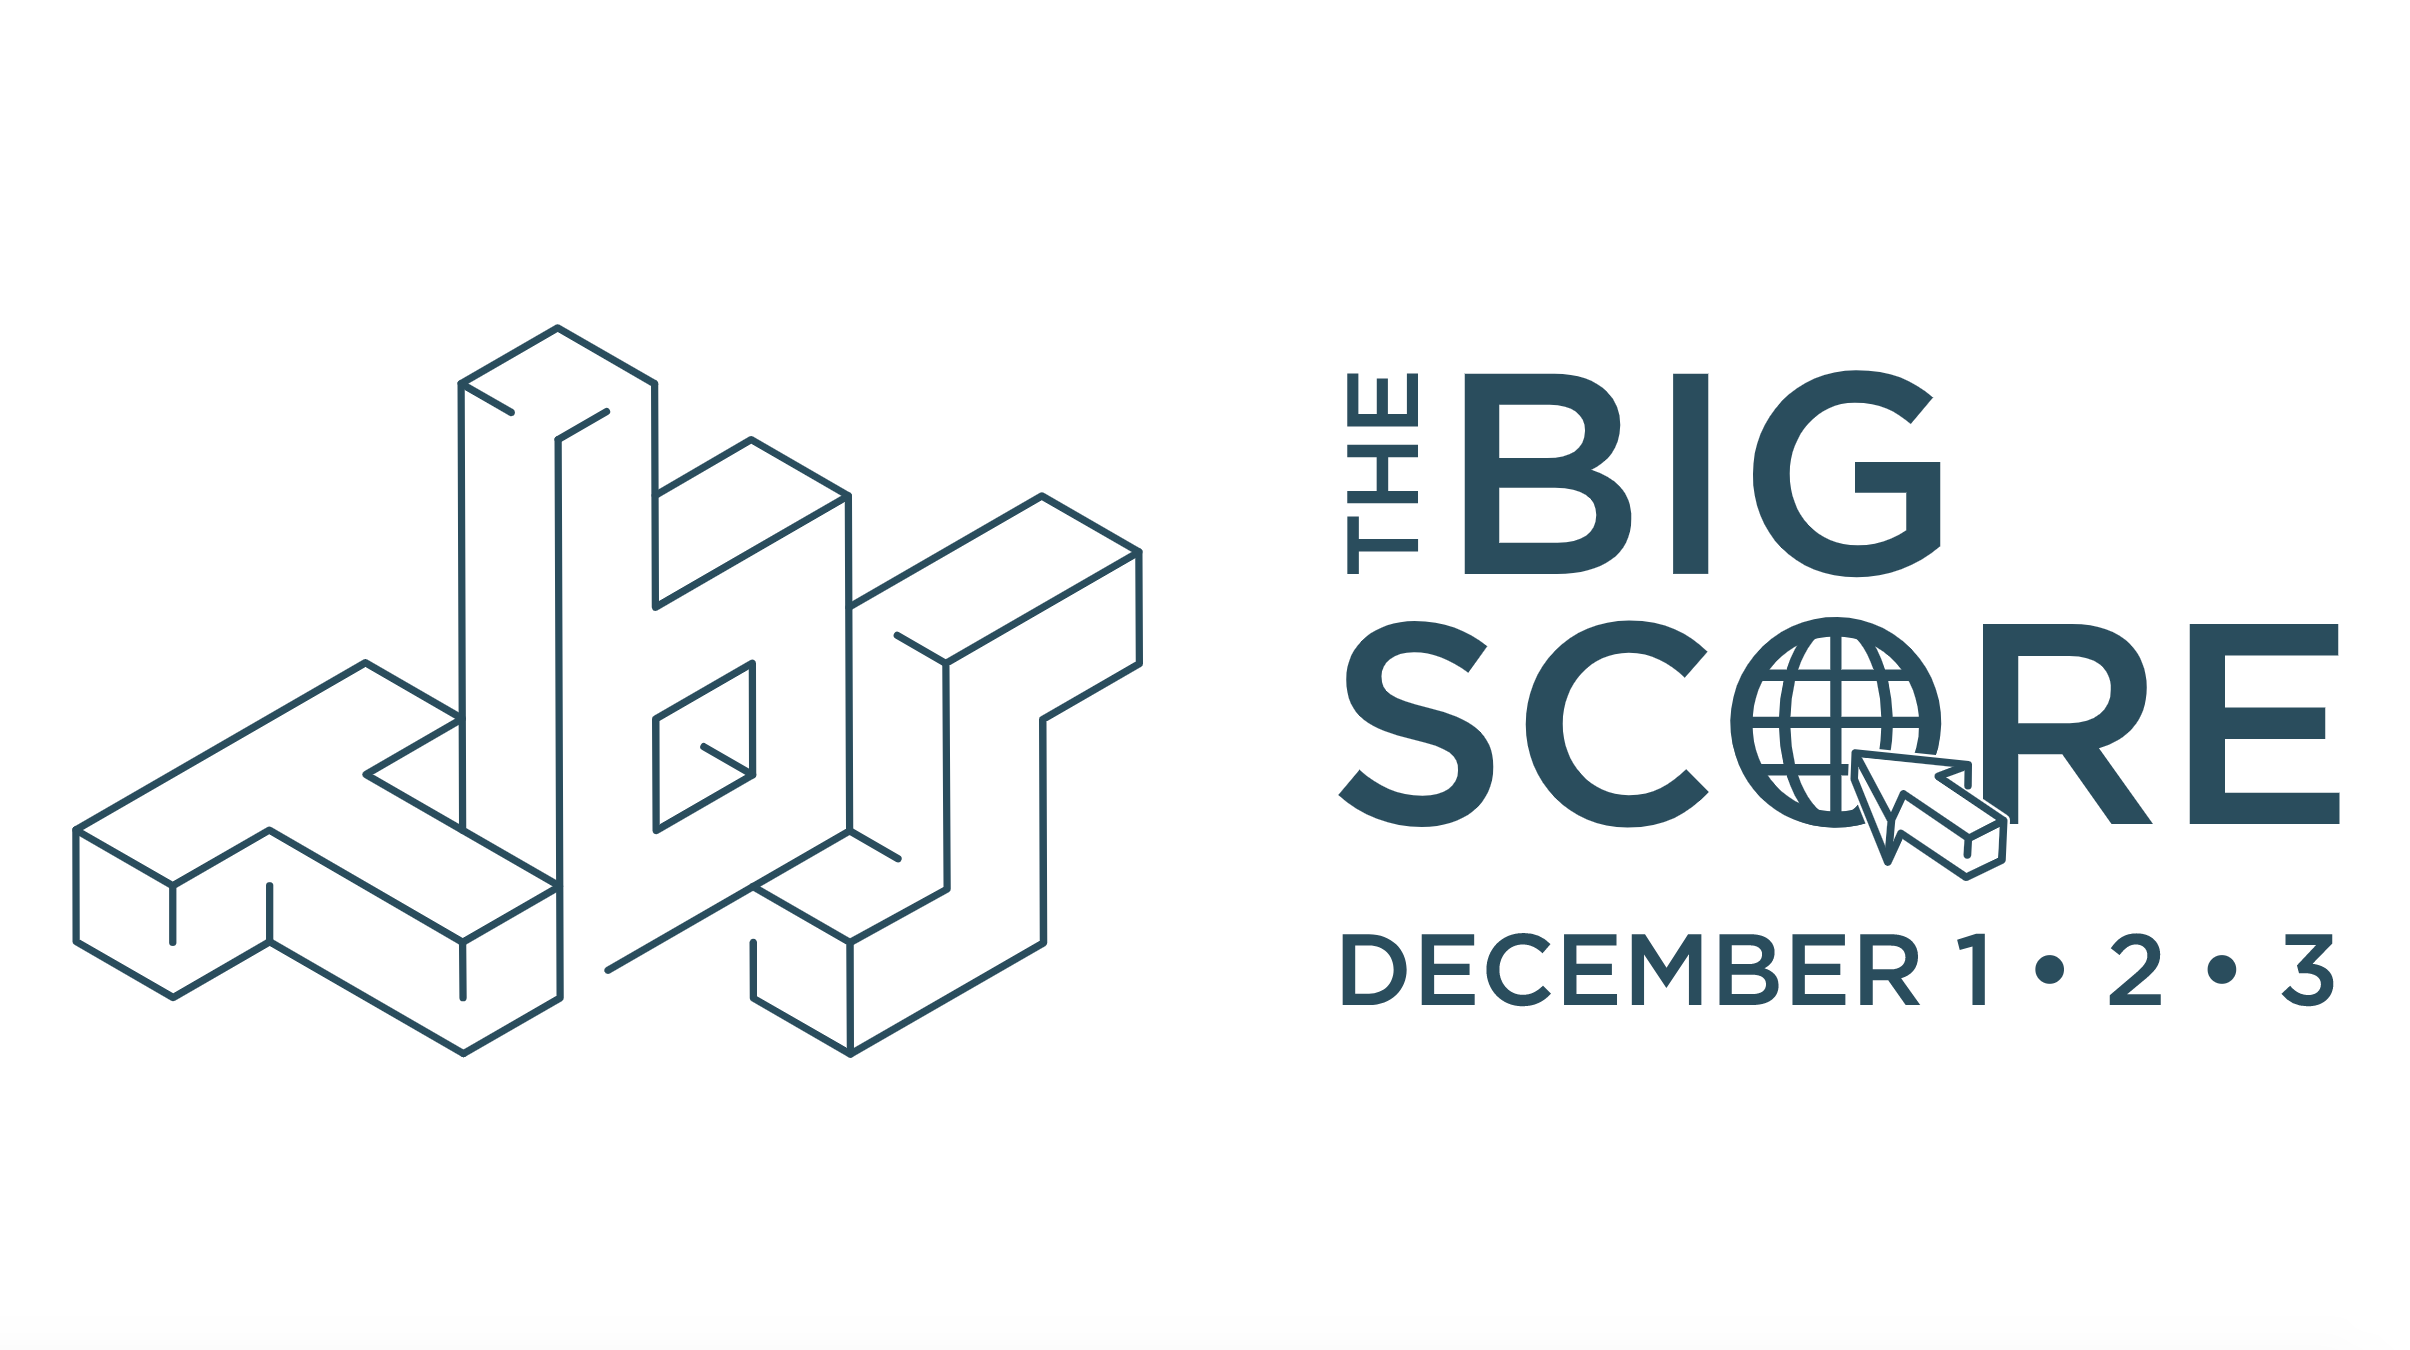 The Big Score's logo